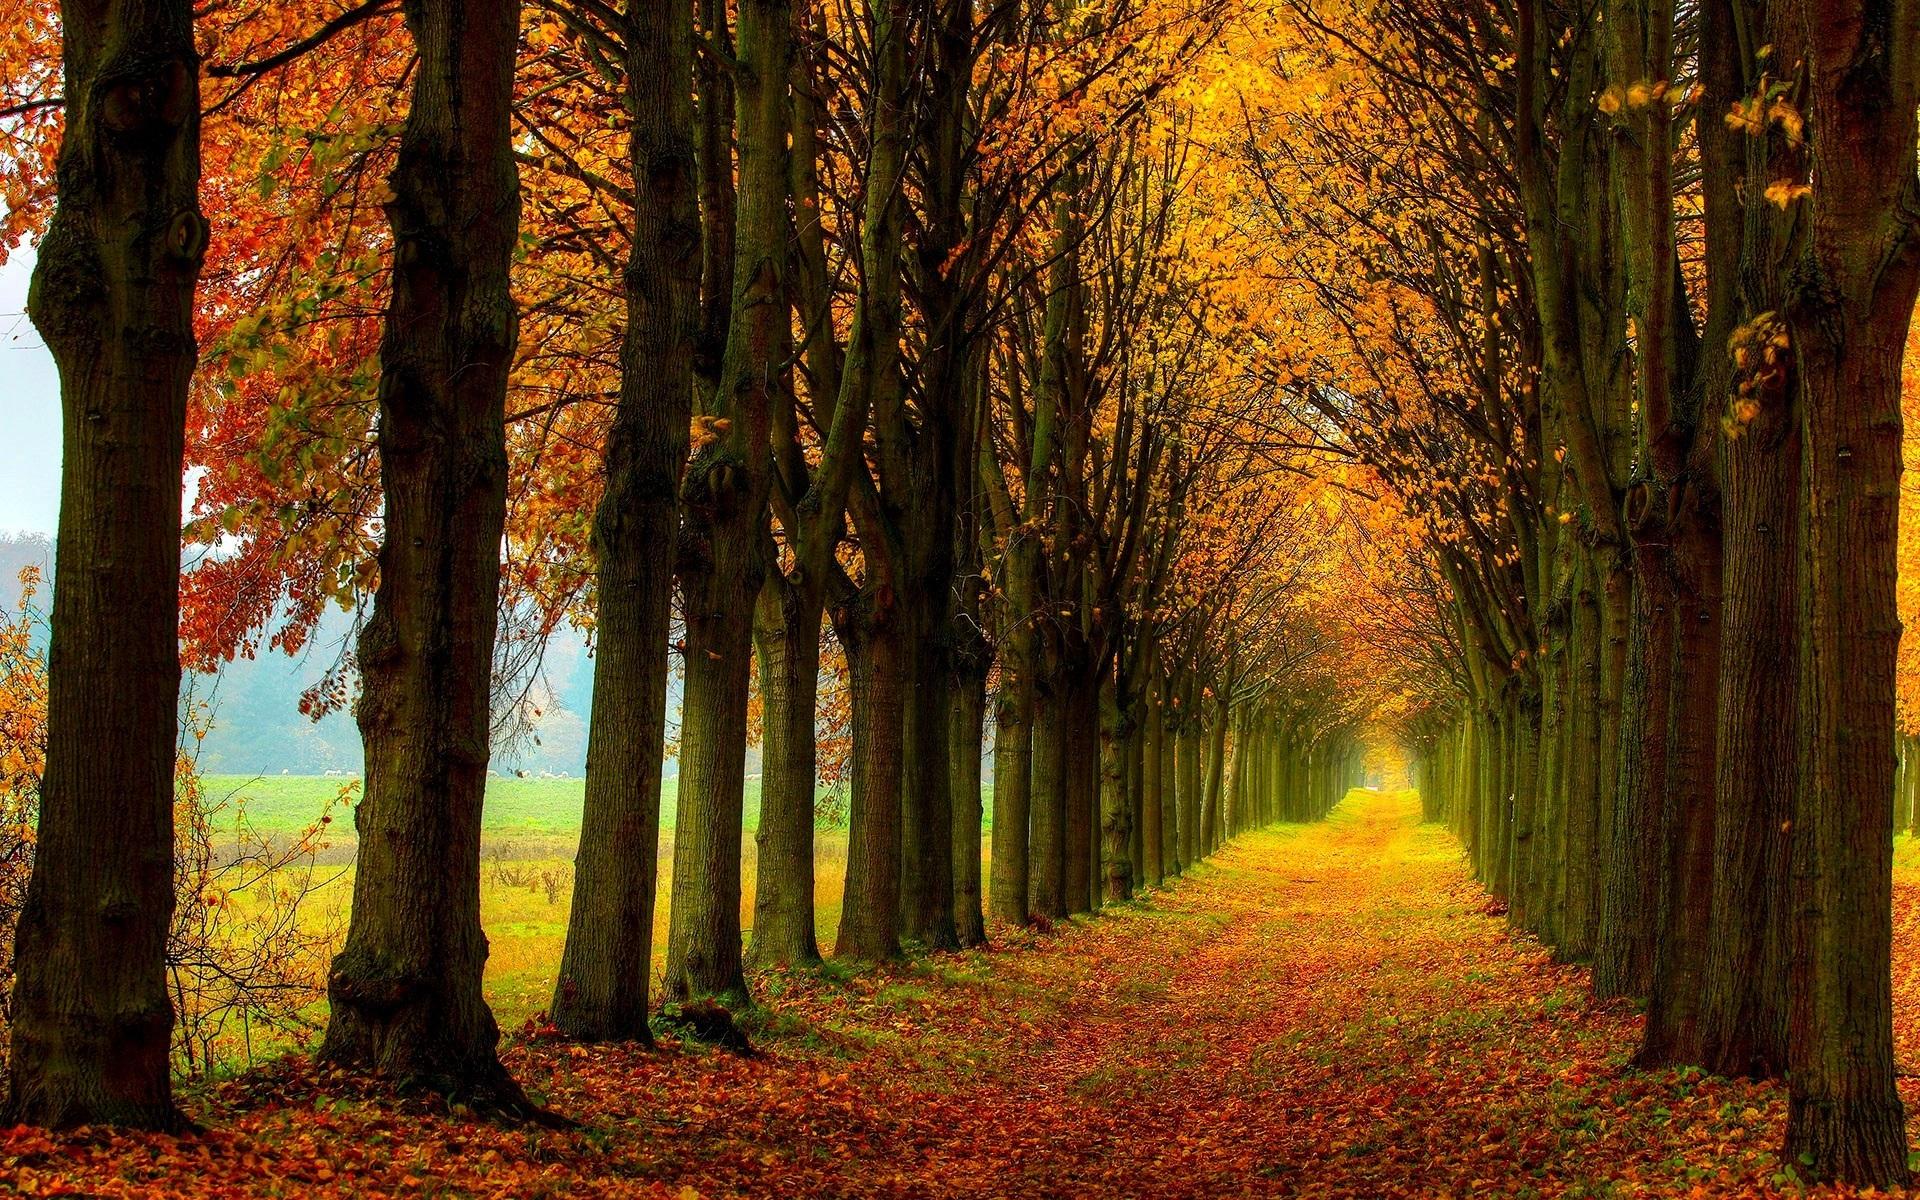 Autumn Fall Wallpaper 1600x900 Beautiful Nature Scenery Forest Trees Autumn Path